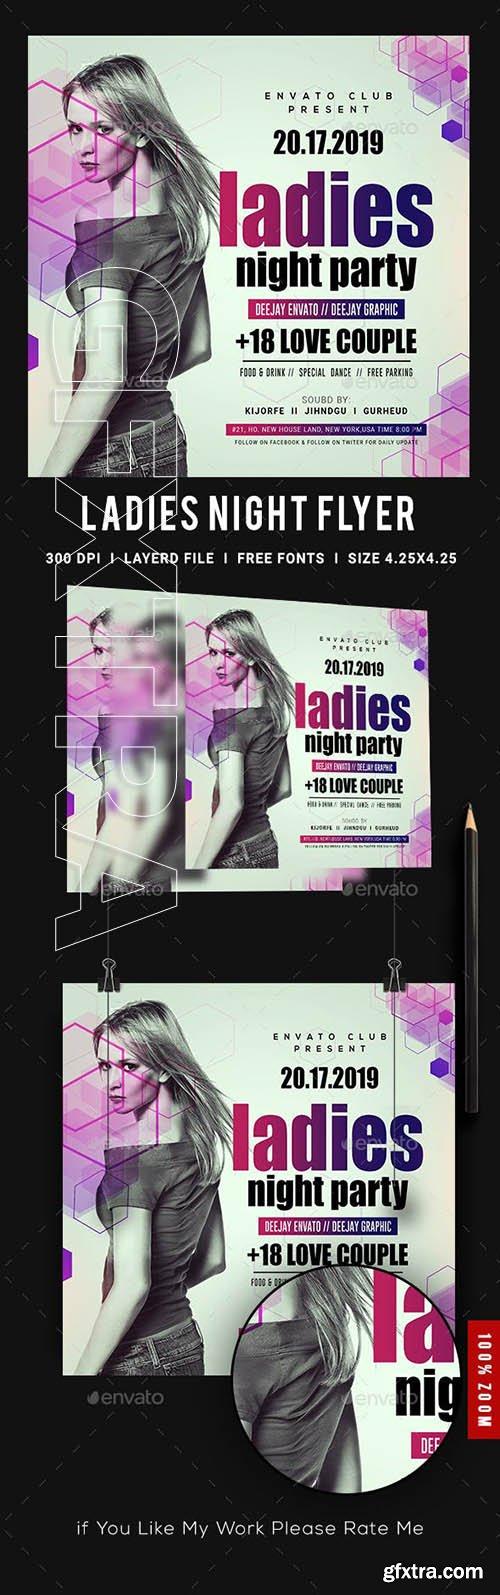 GraphicRiver - Ladies Night Club Flyer 23139277